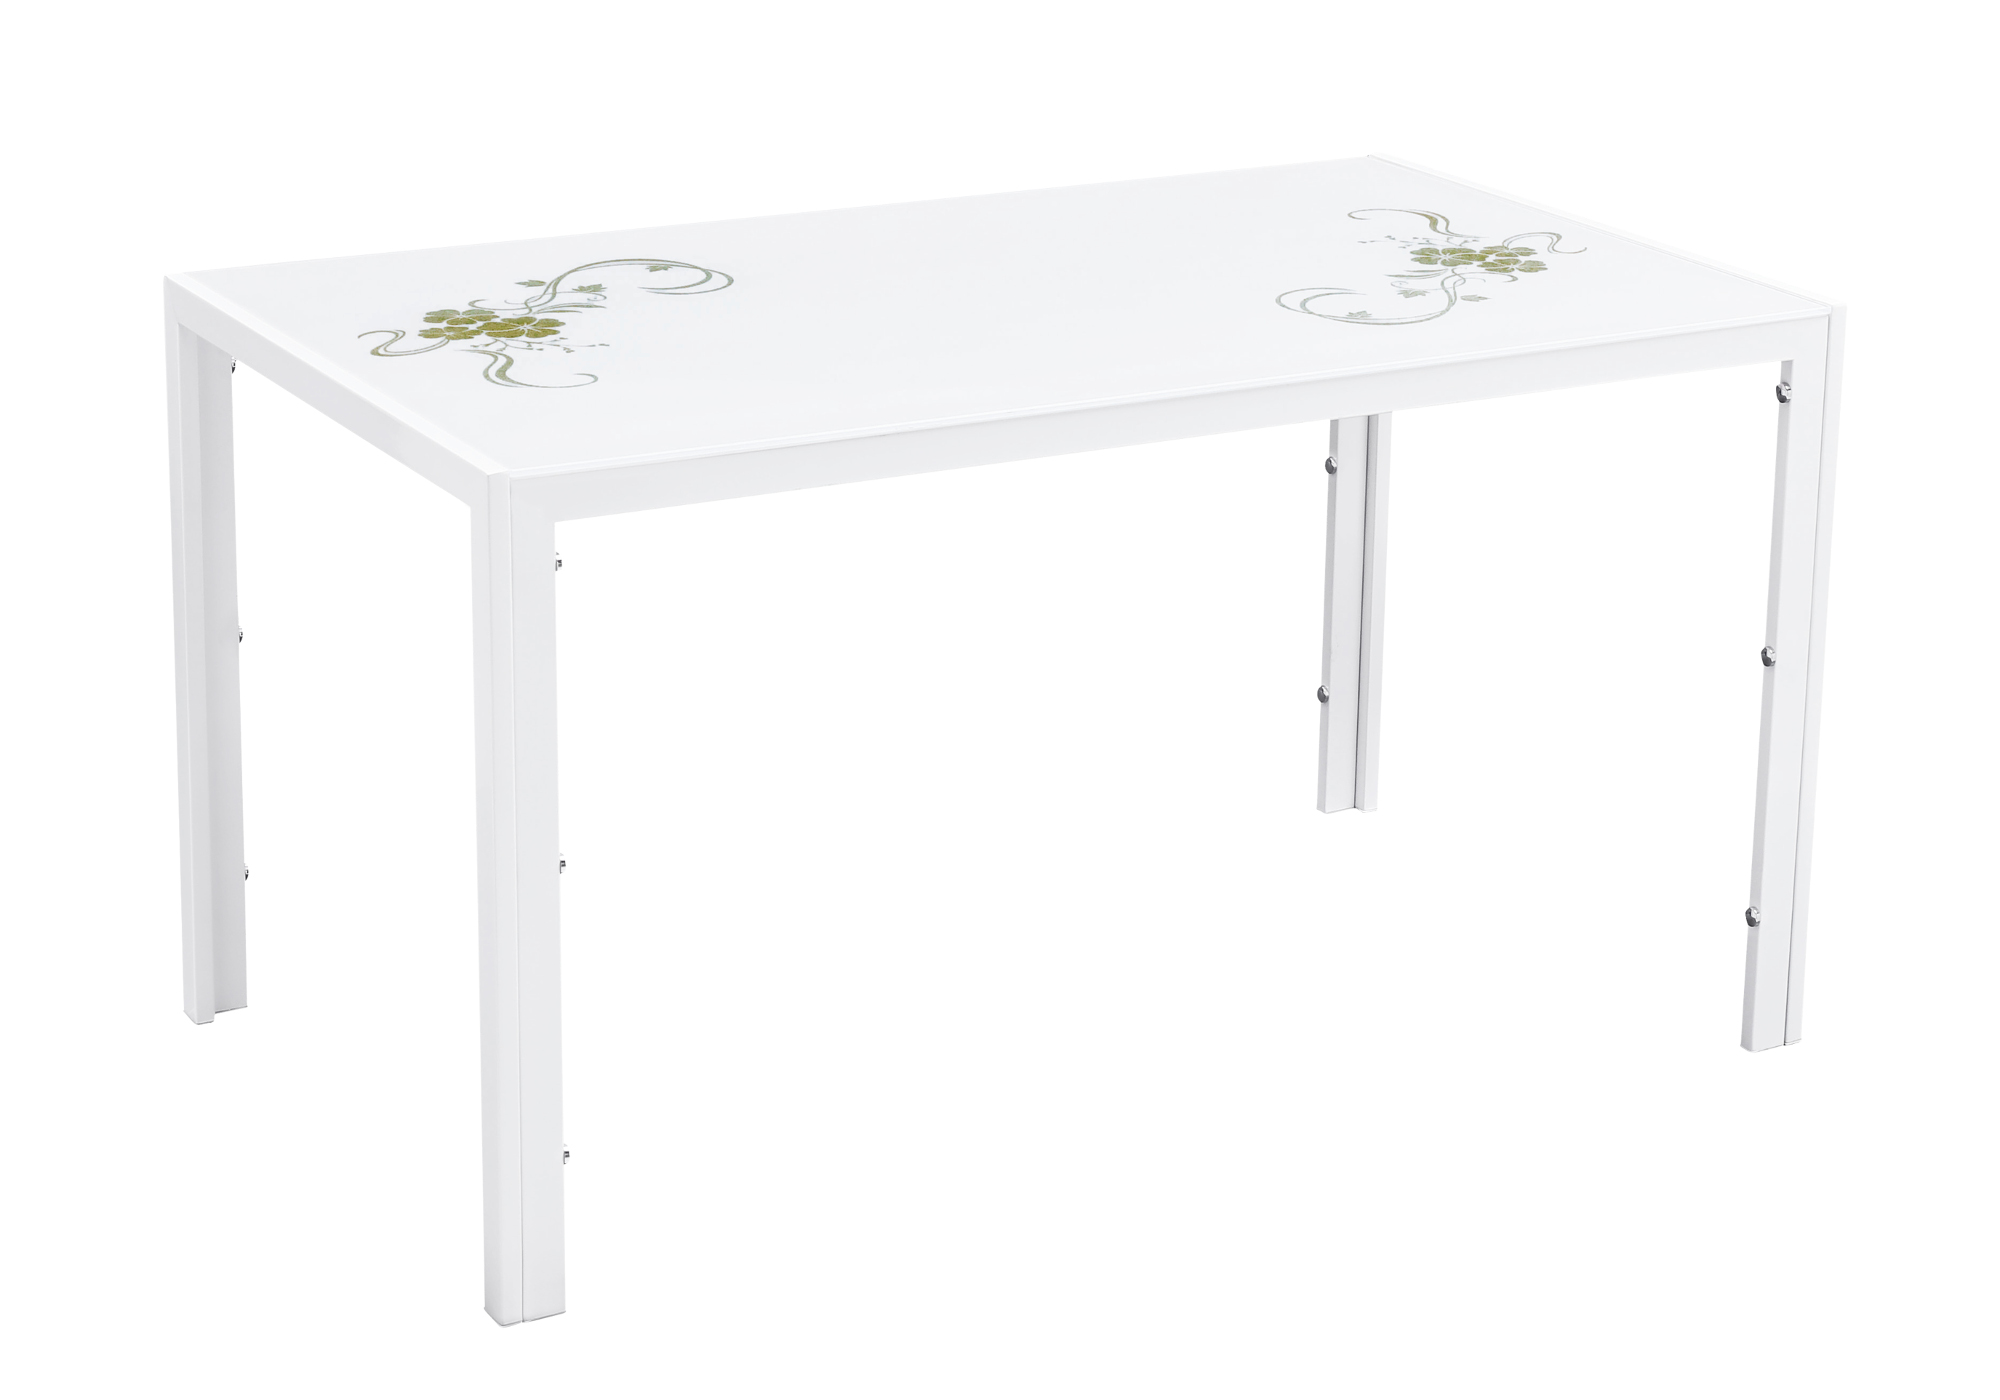 Table manger verre trempé blanc OLYA